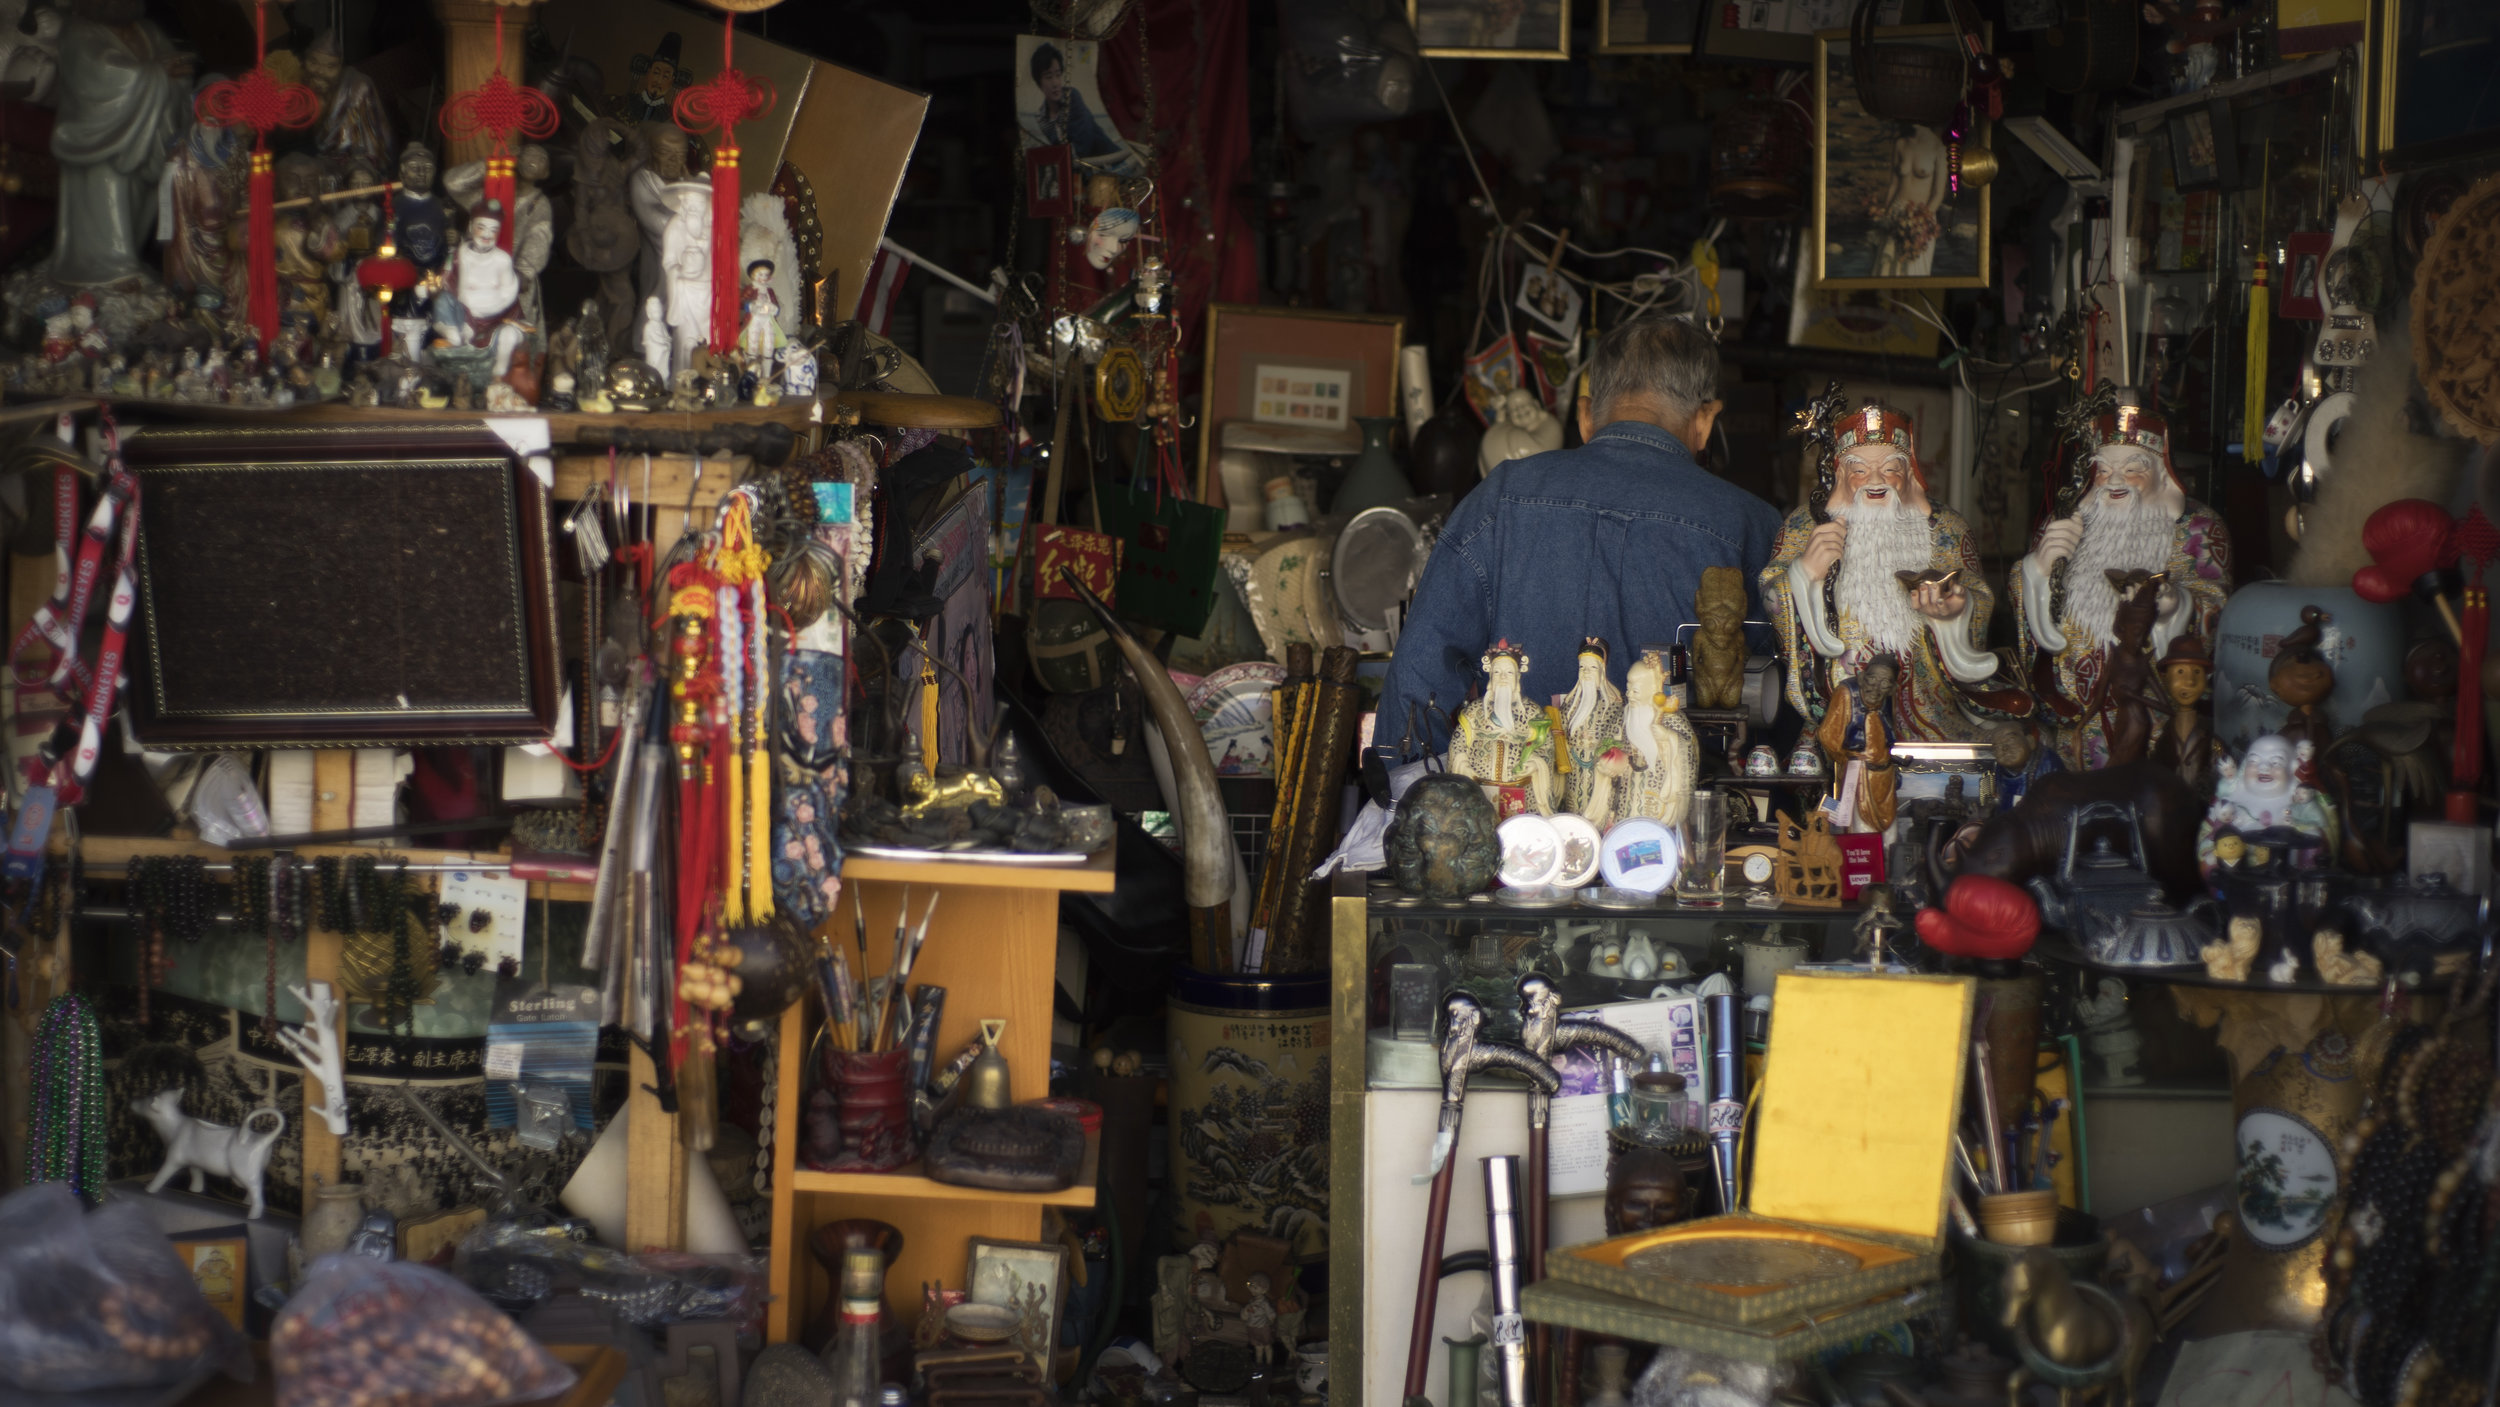 Man in Garage, San Francisco, CA, 2016